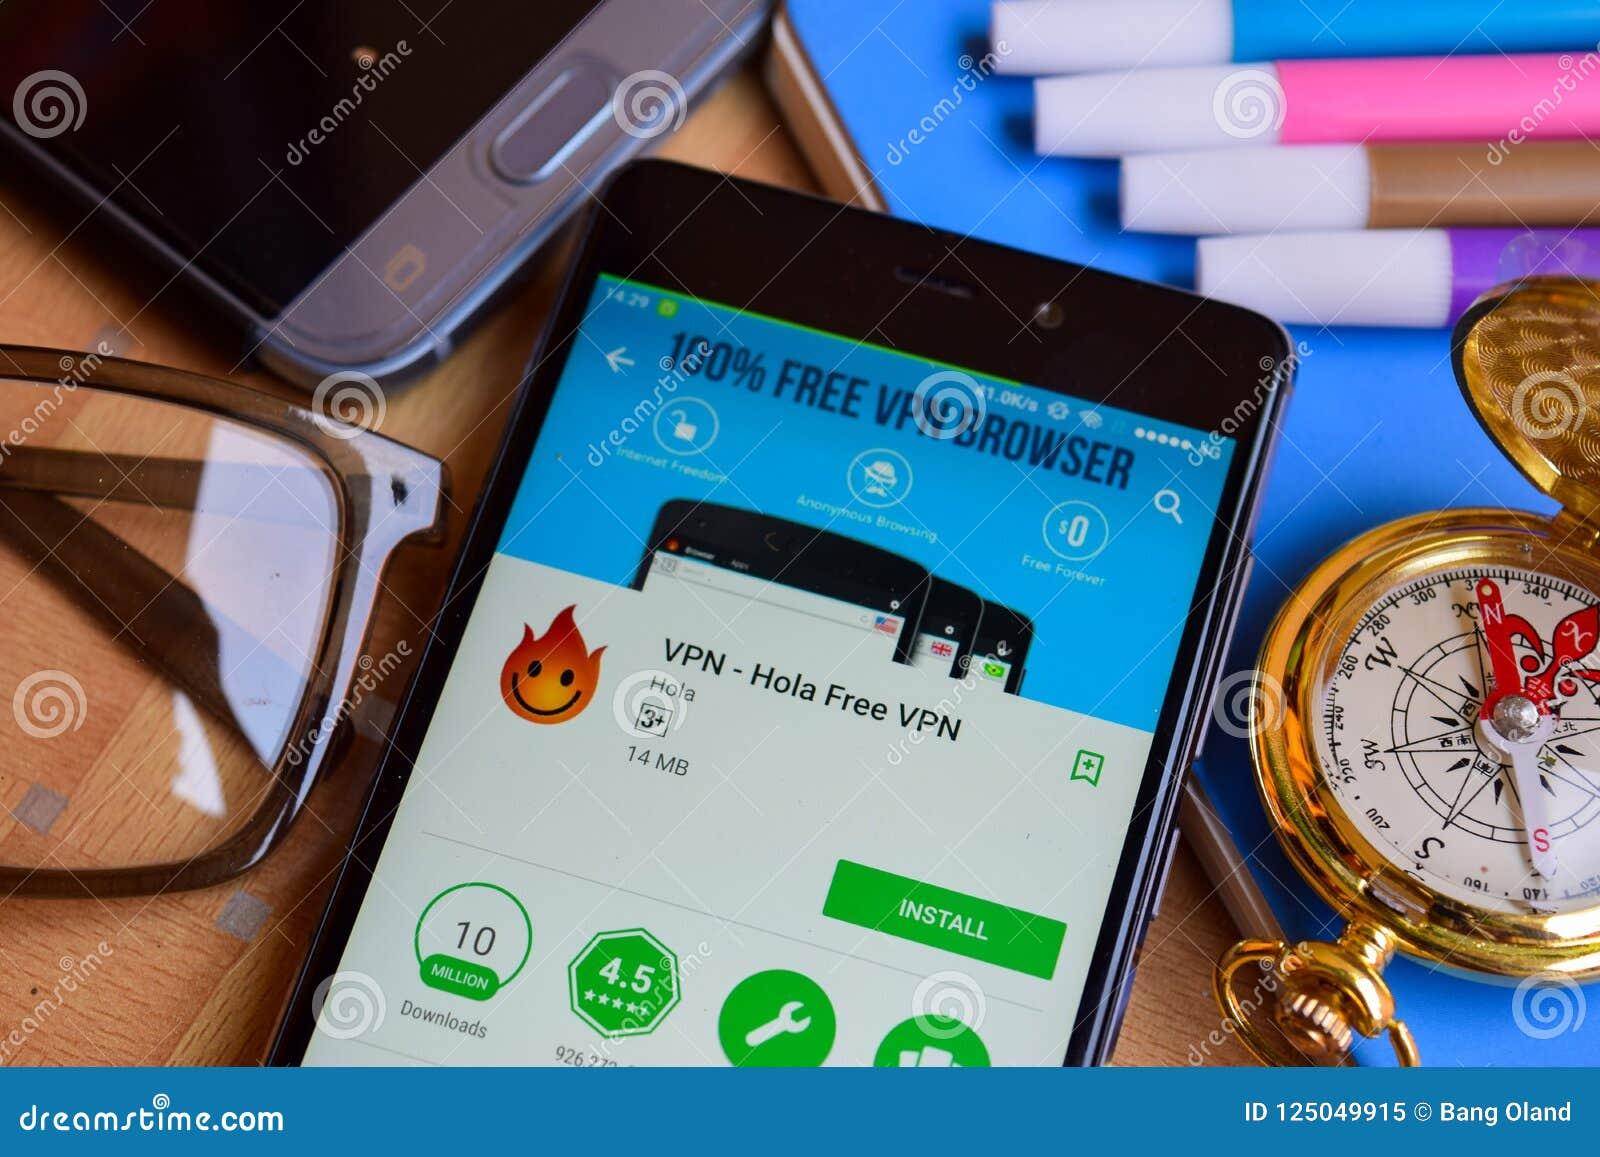 VPN - Hola Free VPN Dev App On Smartphone Screen  Editorial Image